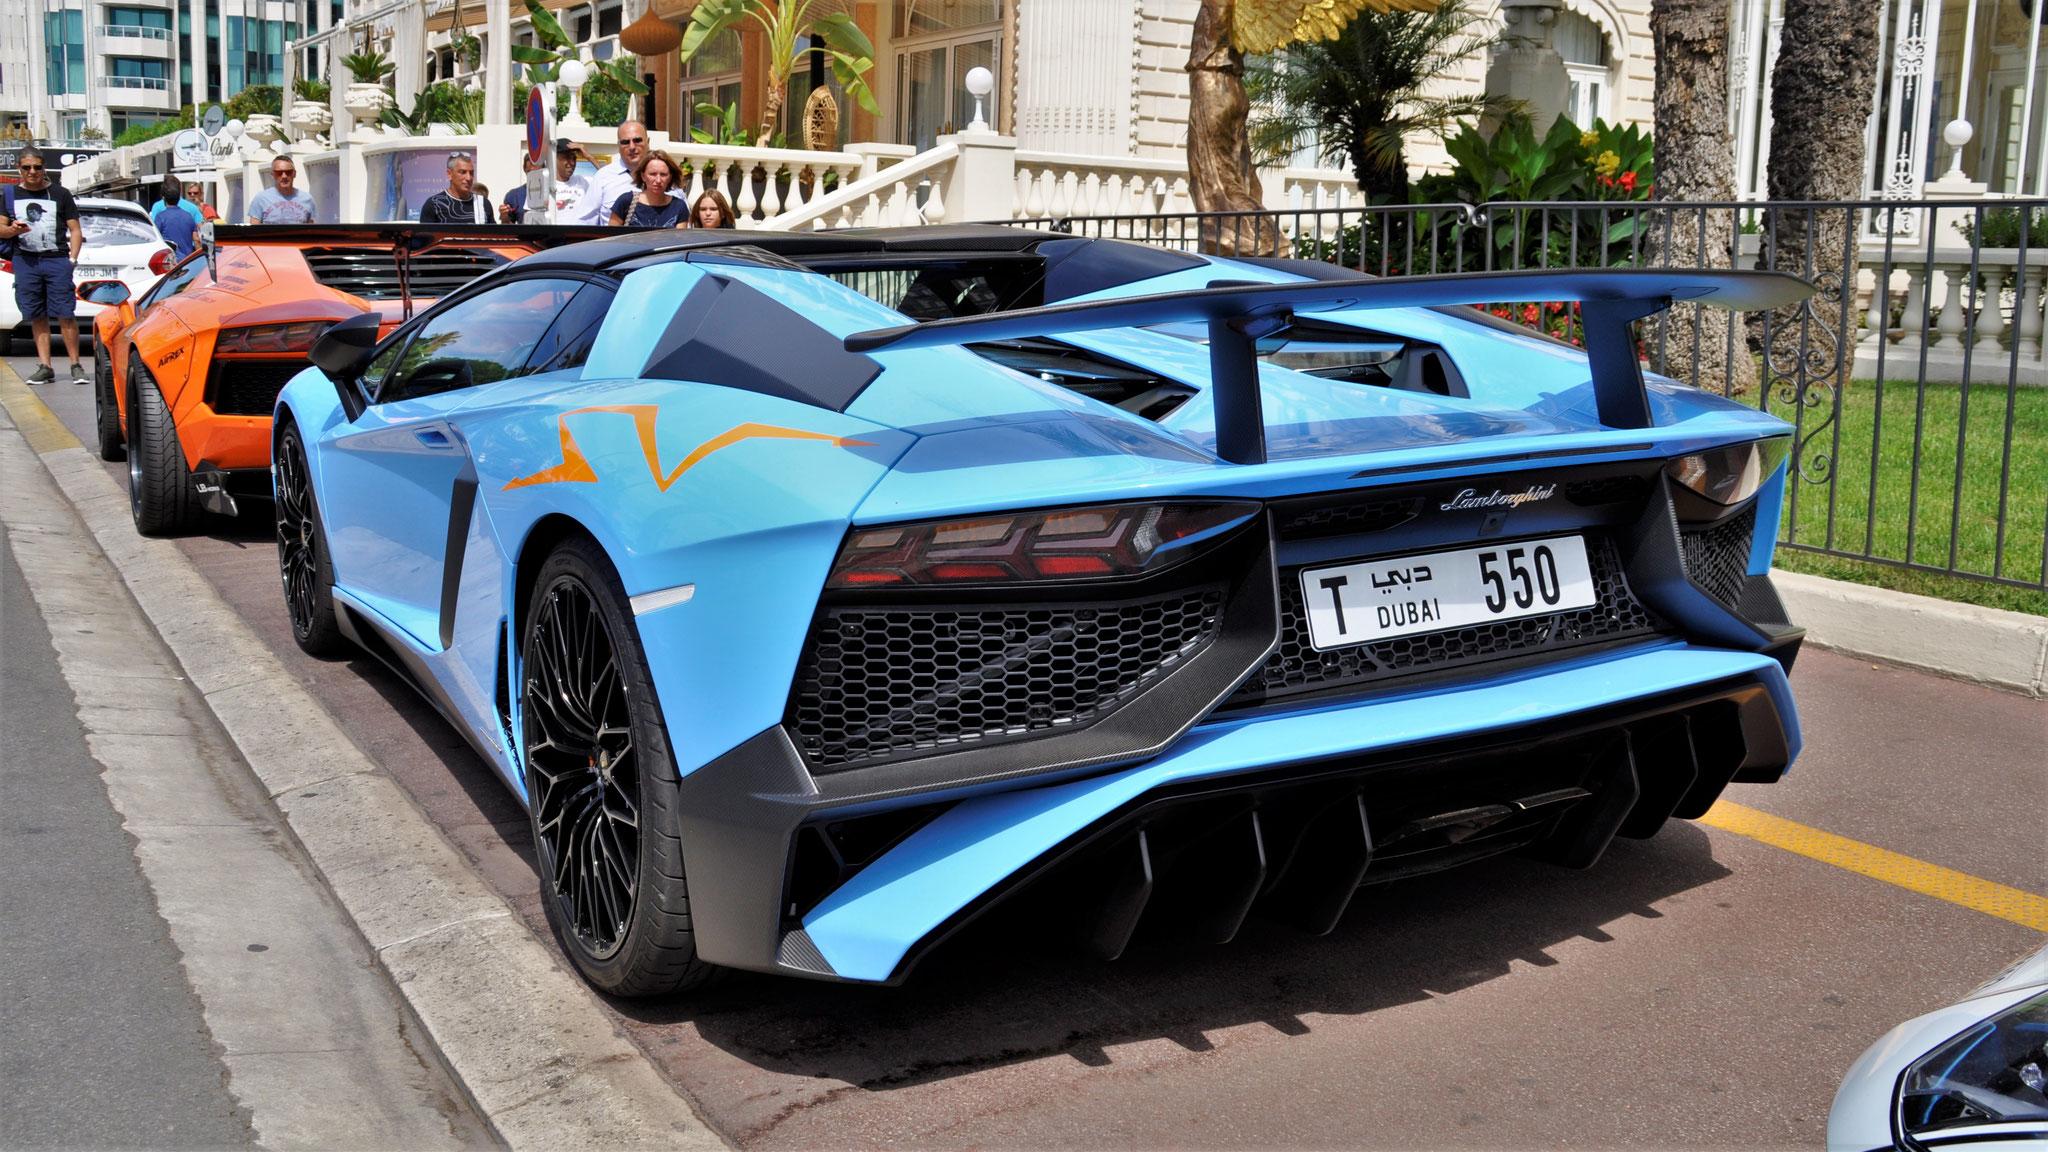 Lamborghini Aventador LP-750-4 SV Roadster - T-550 (Dubai)